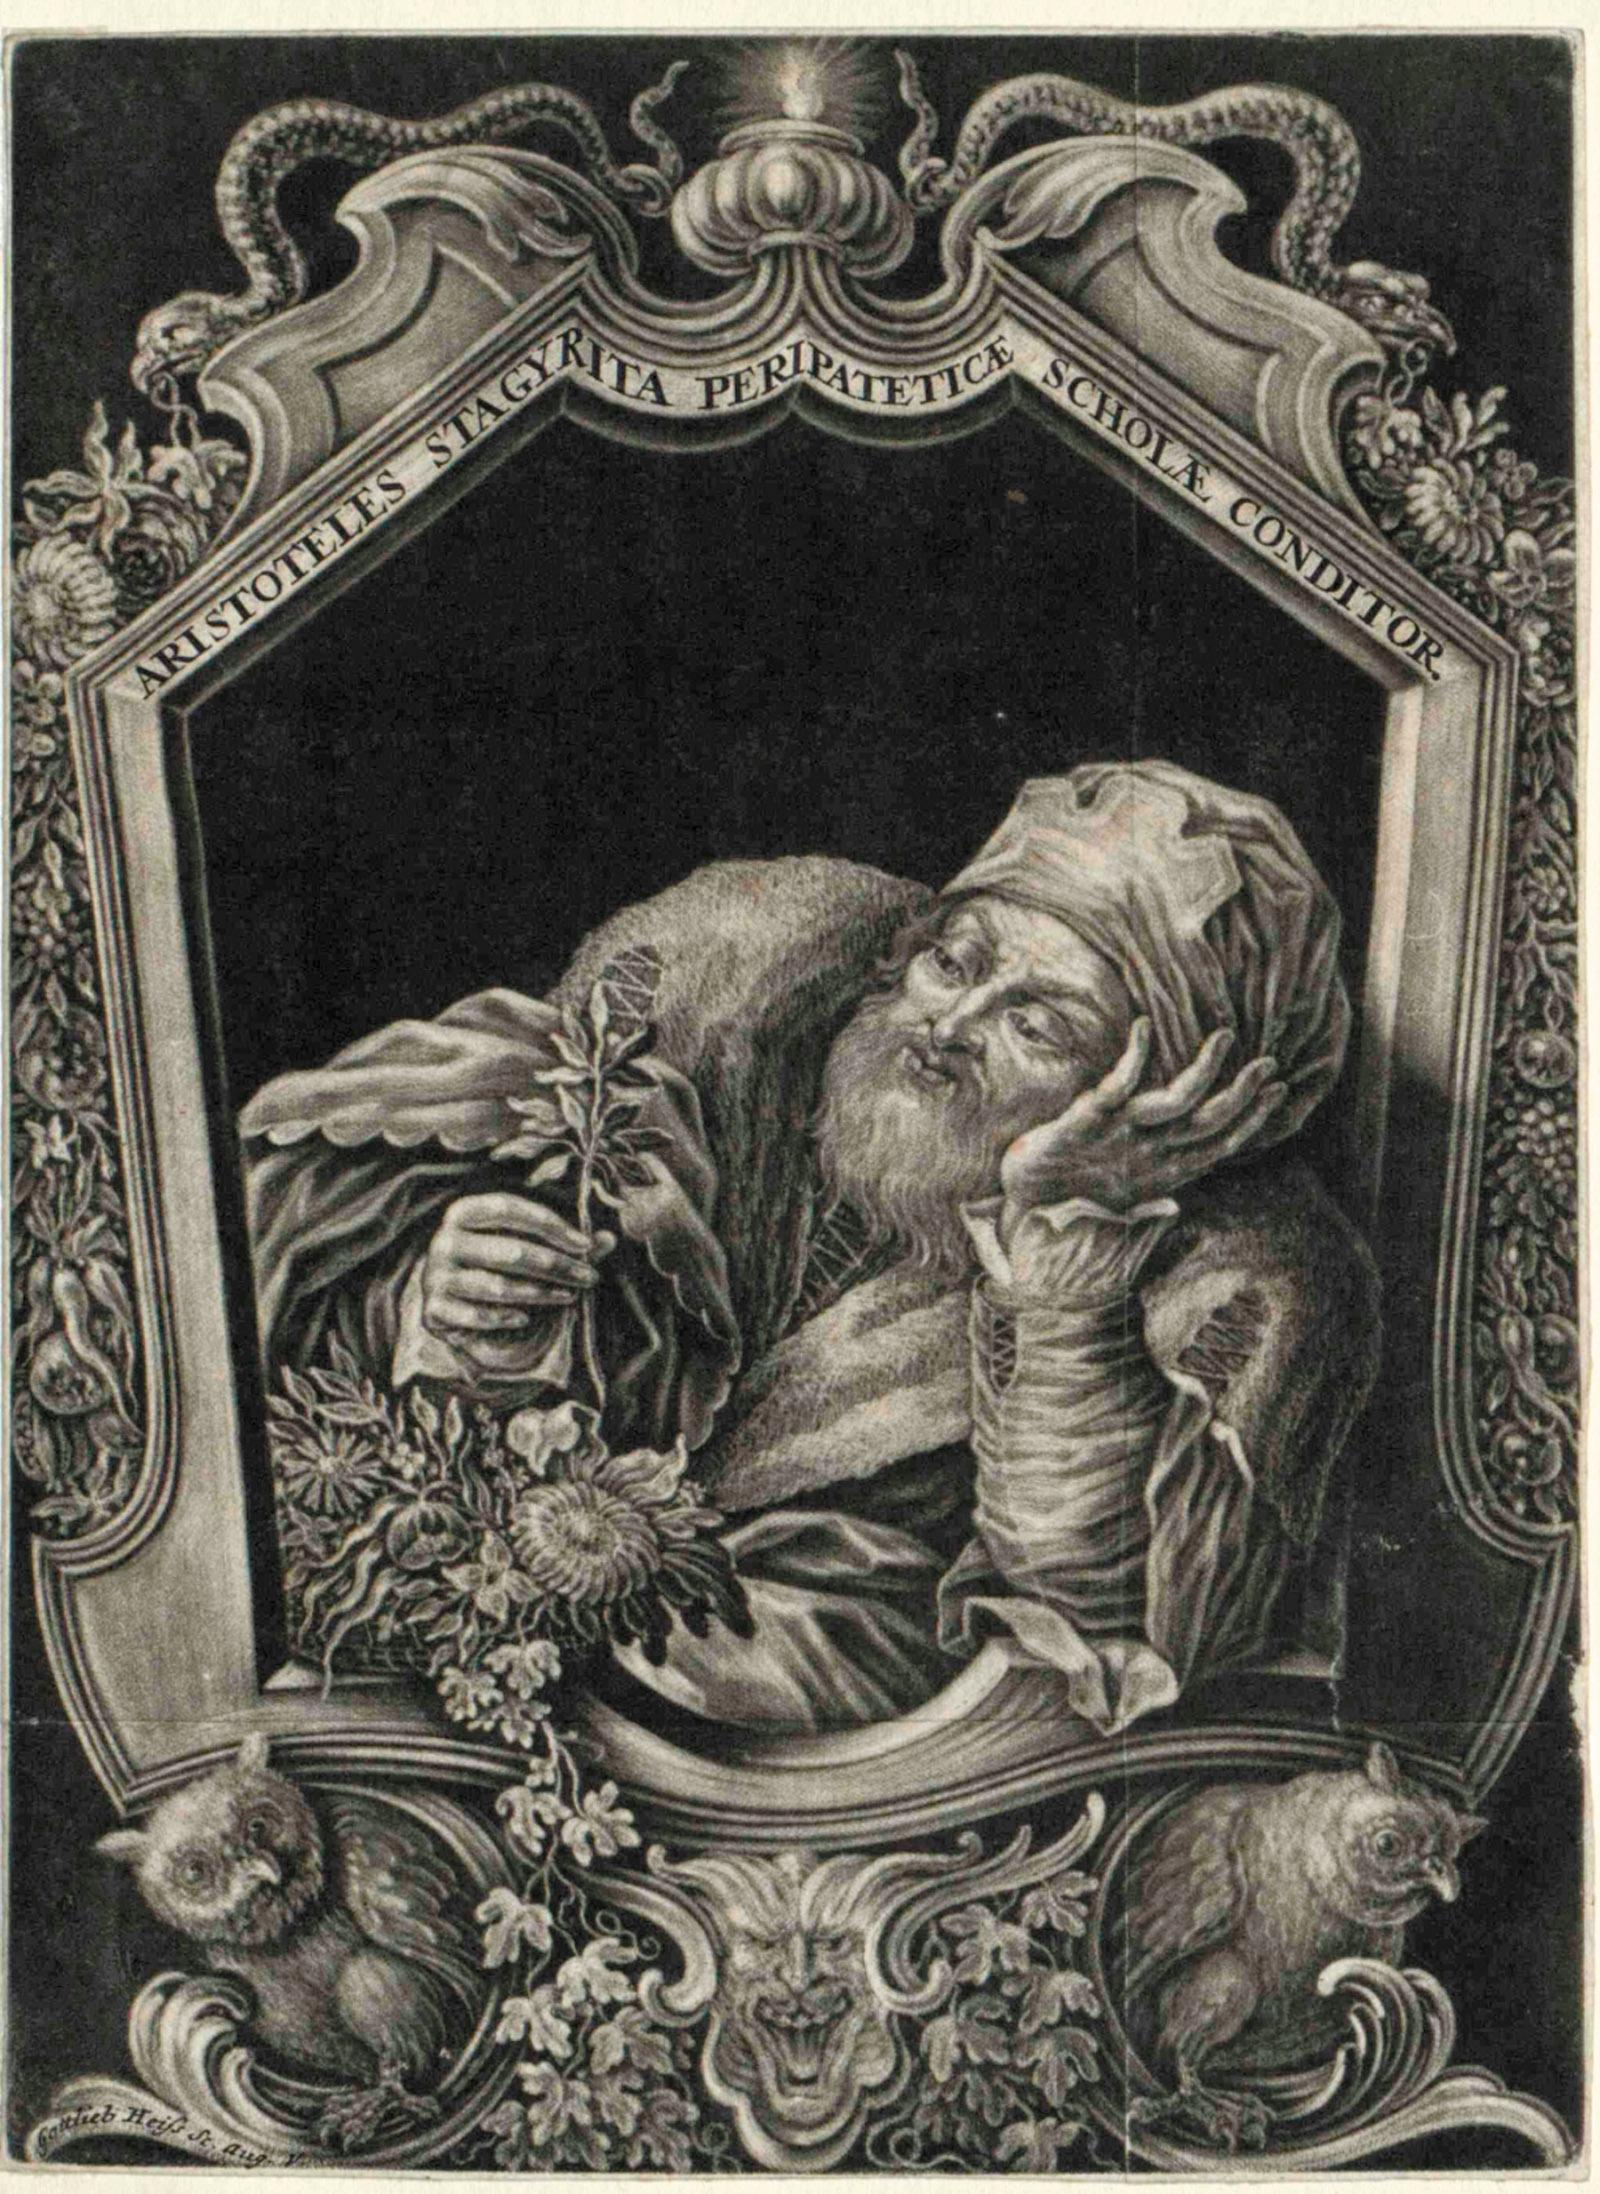 Aristotle; mezzotint by Gottlieb Heiss, 1684